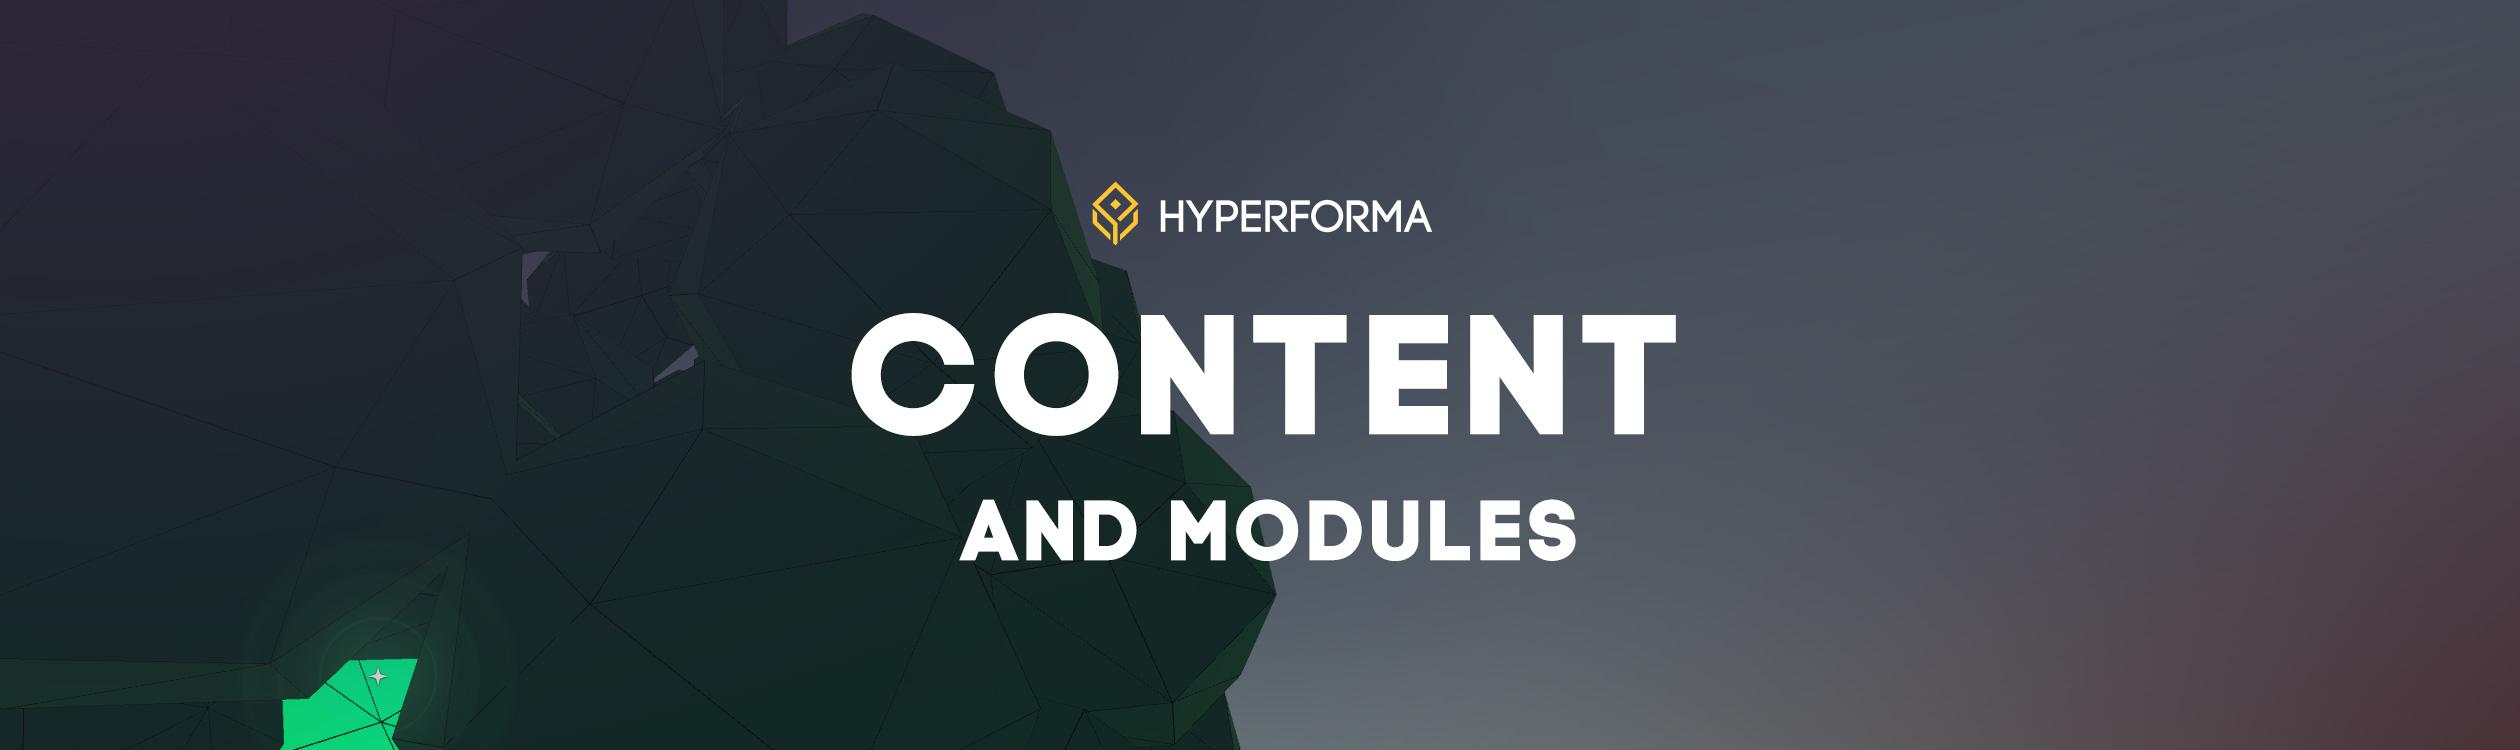 face_content_modules